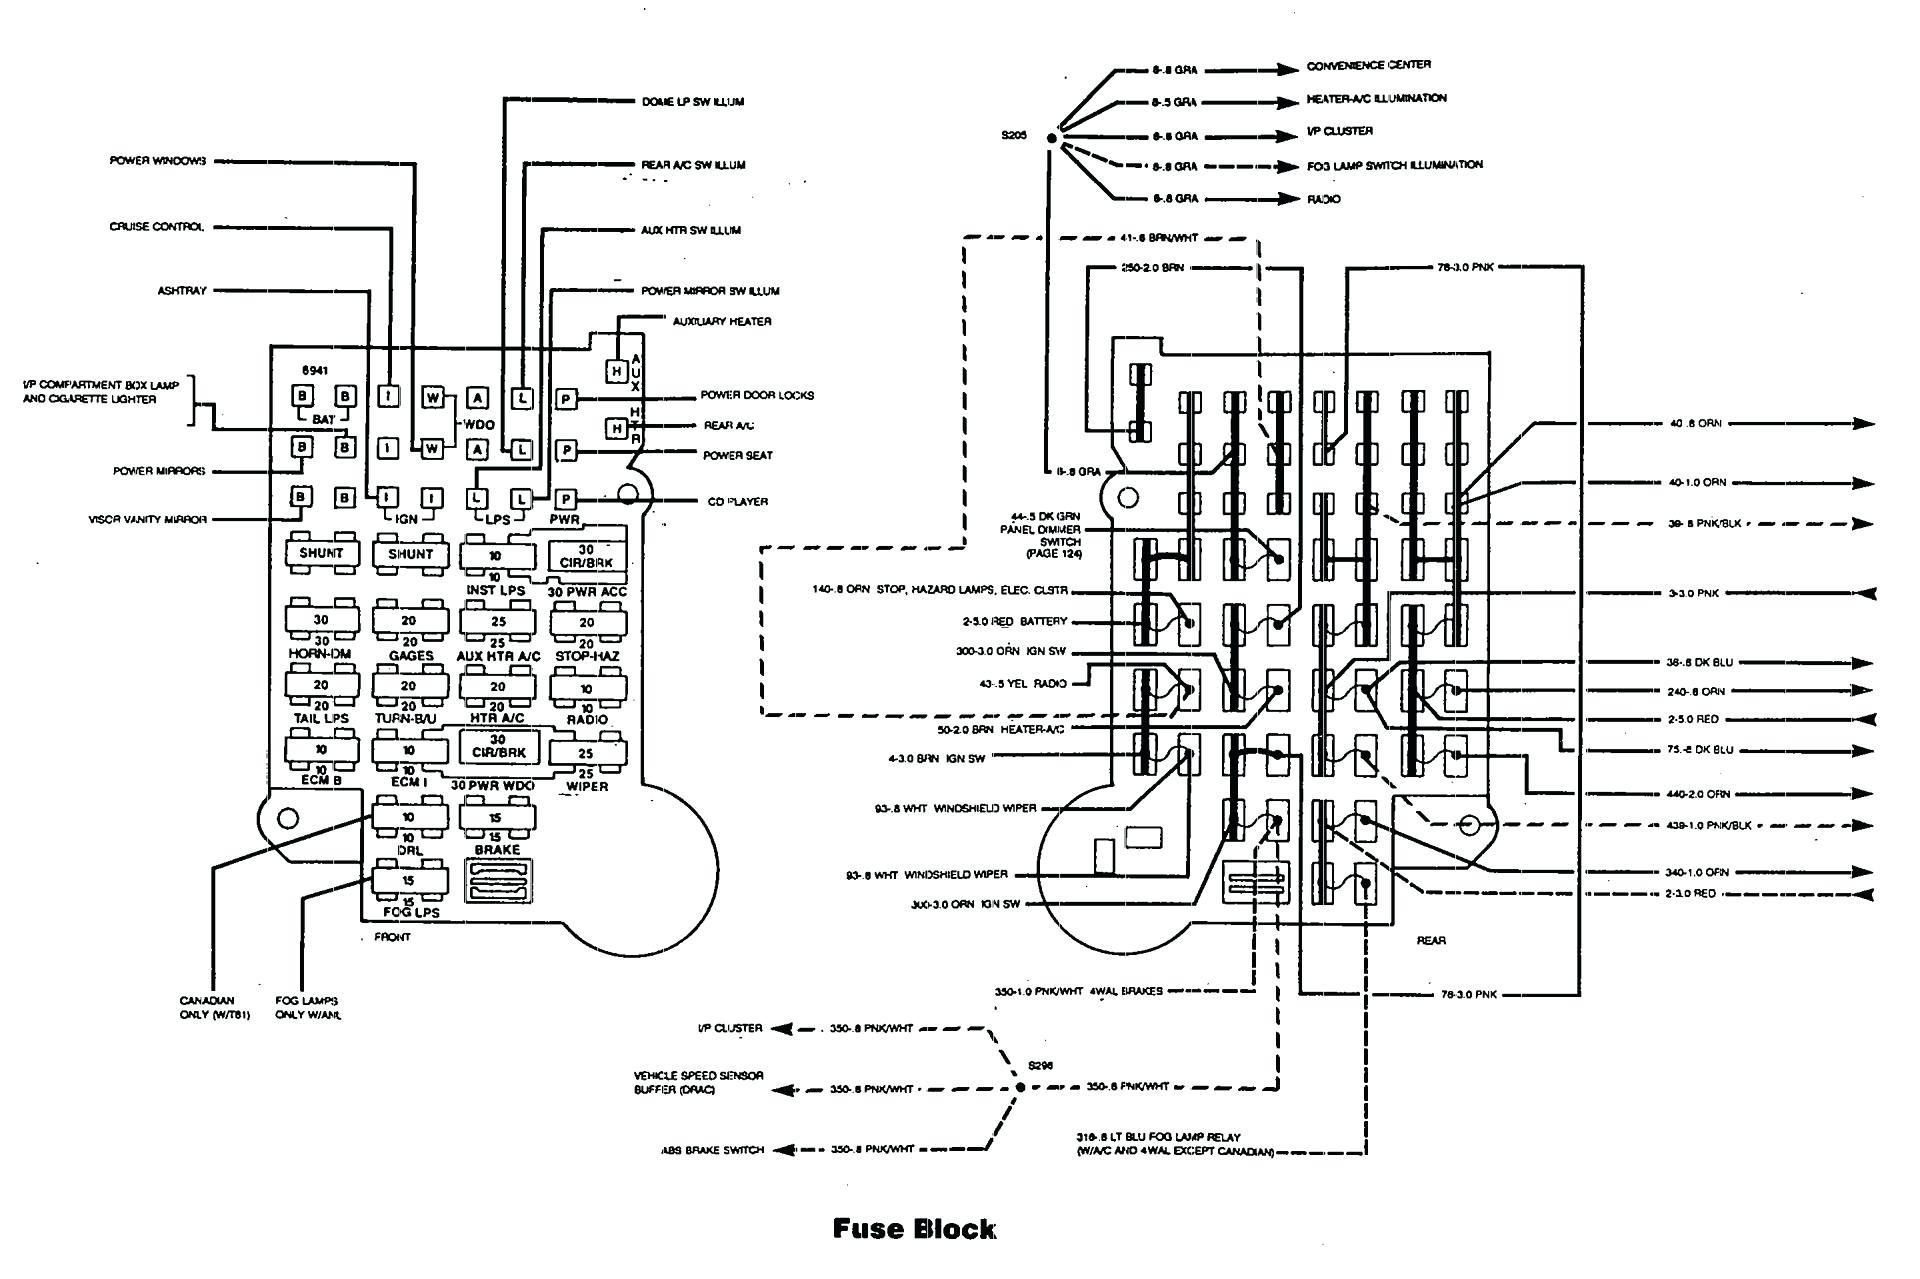 Chrysler Pacifica Windshield Wiper Wiring Diagram Porsche 996 Fuse Diagram For Wiring Diagram Schematics